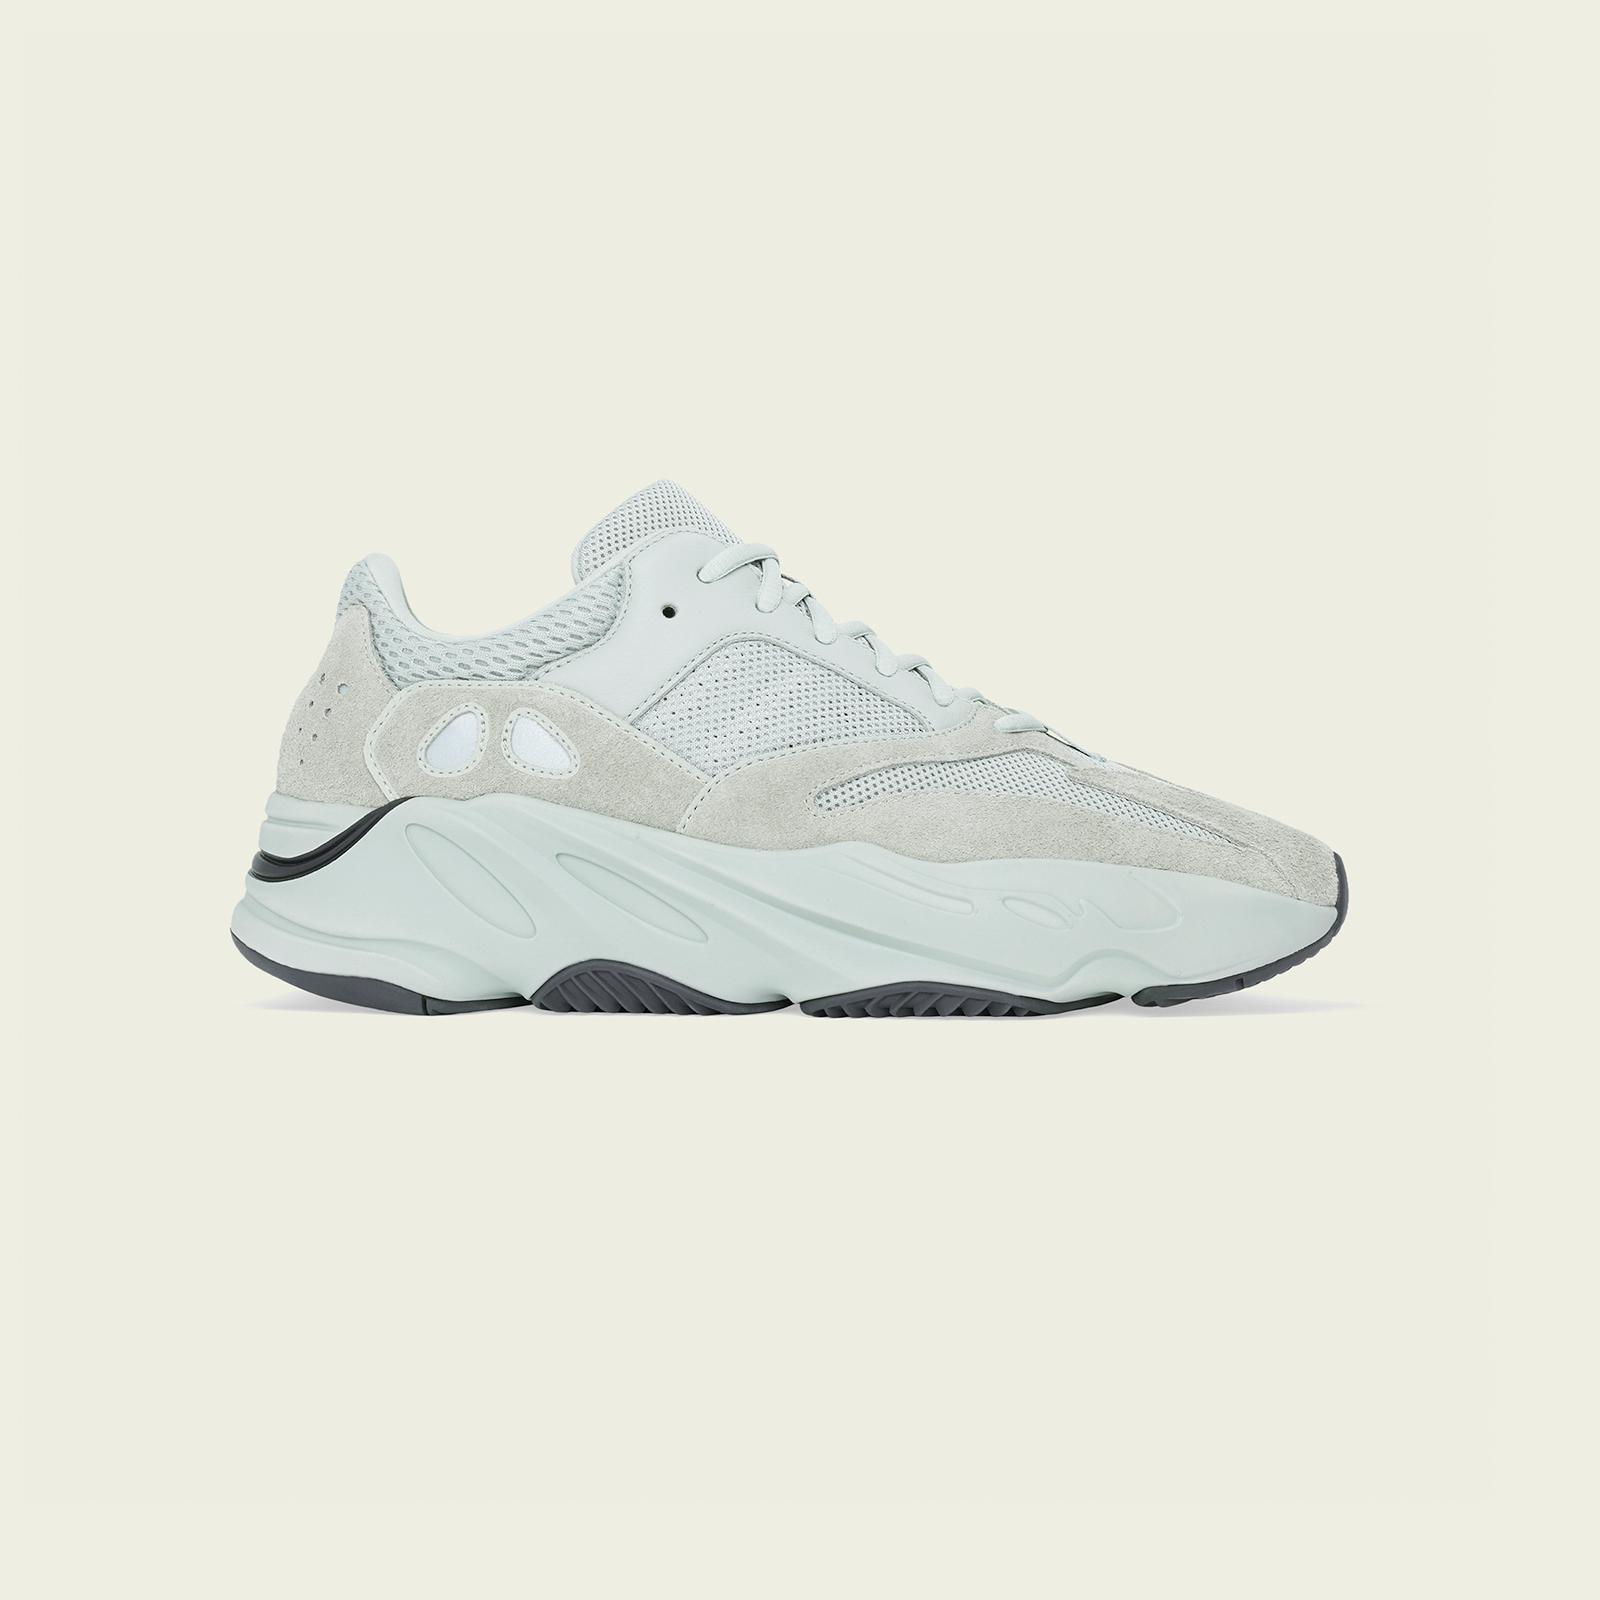 289e9cecd0e adidas Yeezy Boost 700 - Eg7487 - Sneakersnstuff